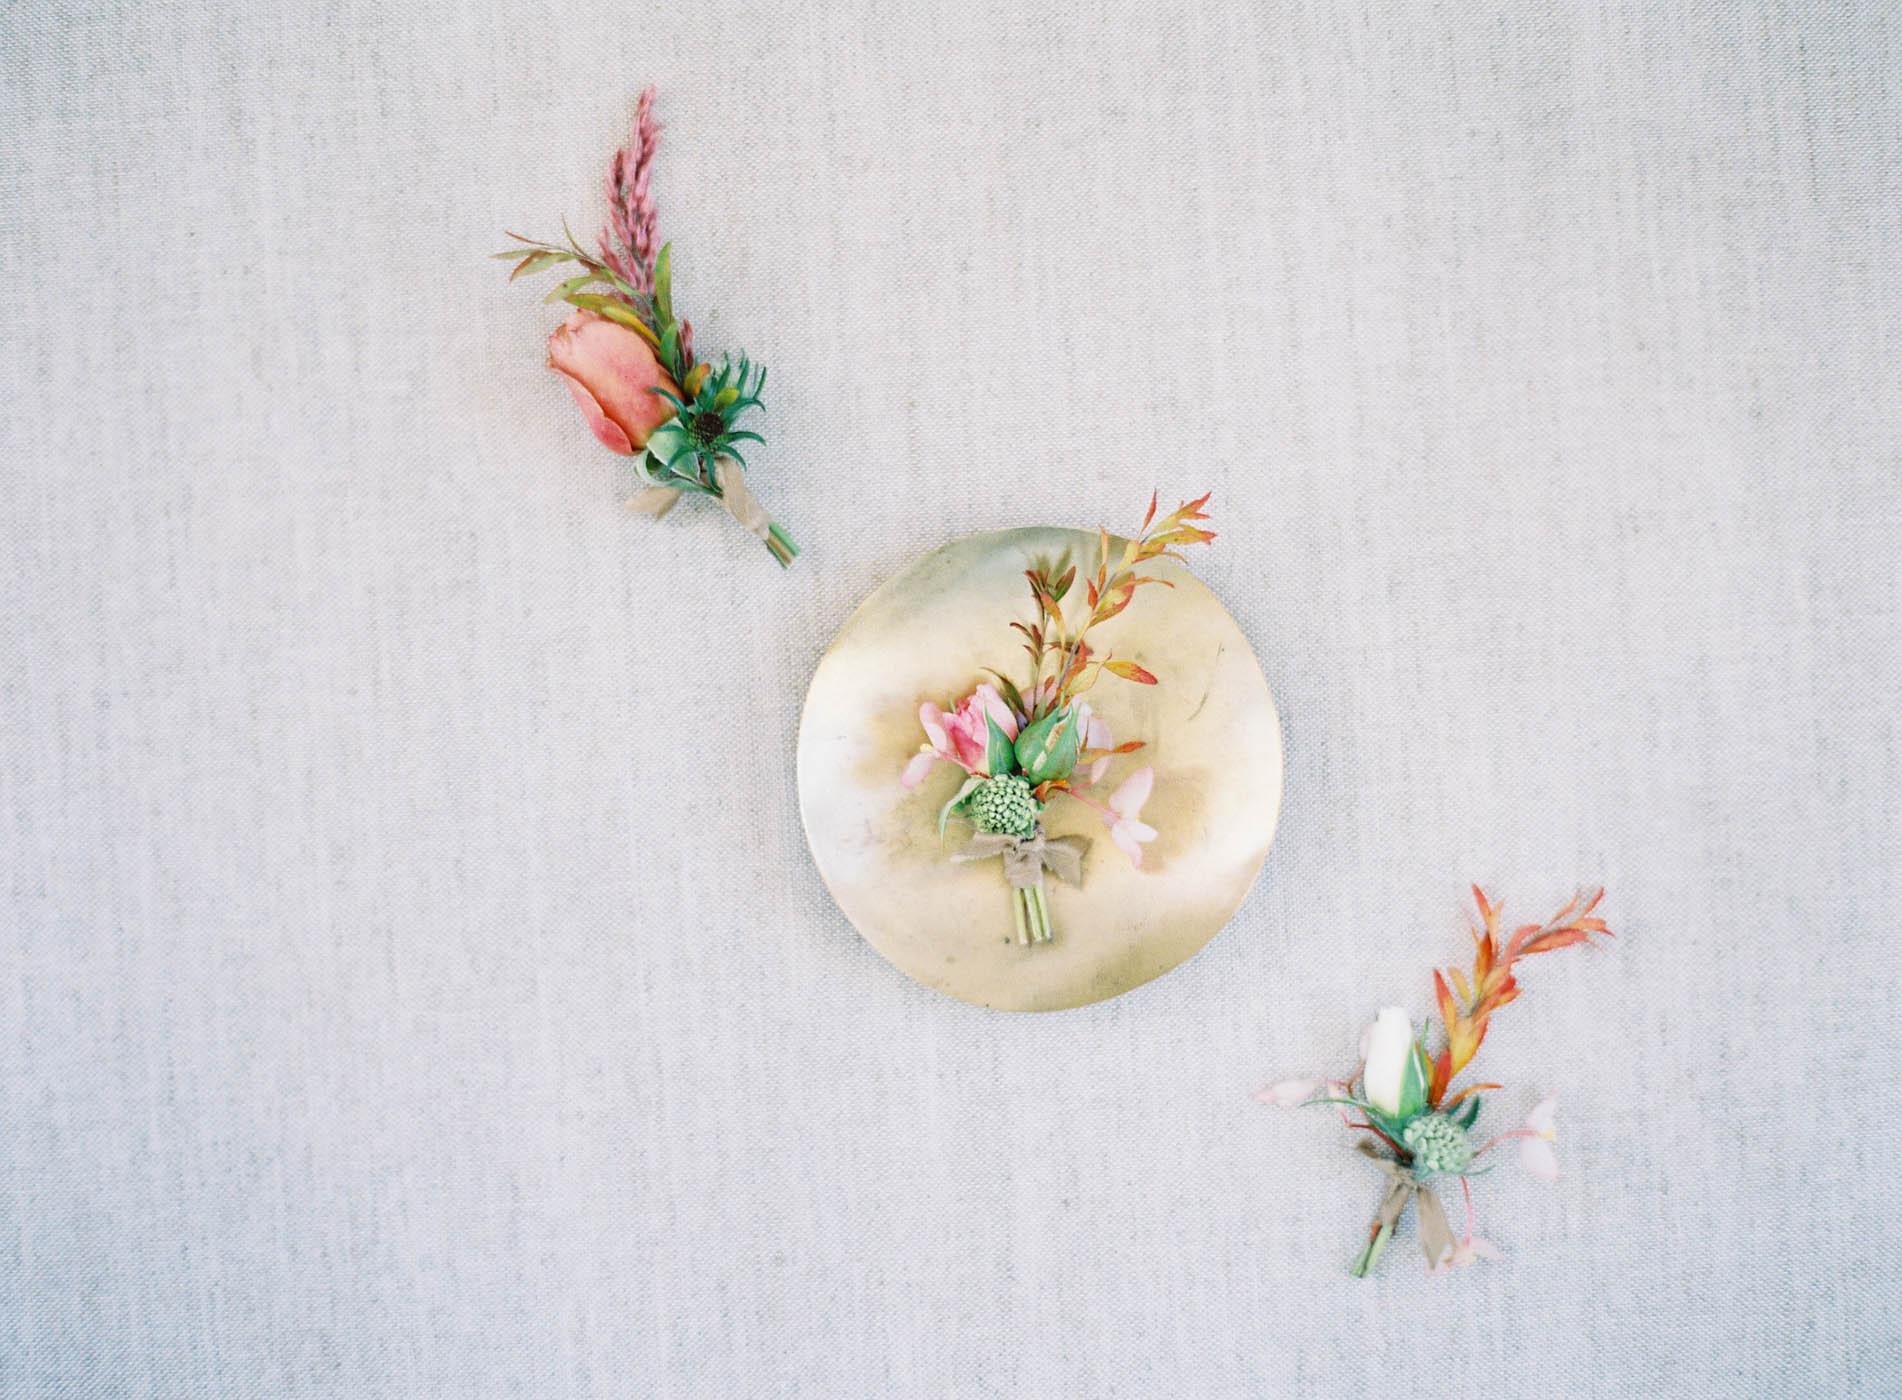 sunstone-villa-kitchen-wedding-jen-huang-6.jpg